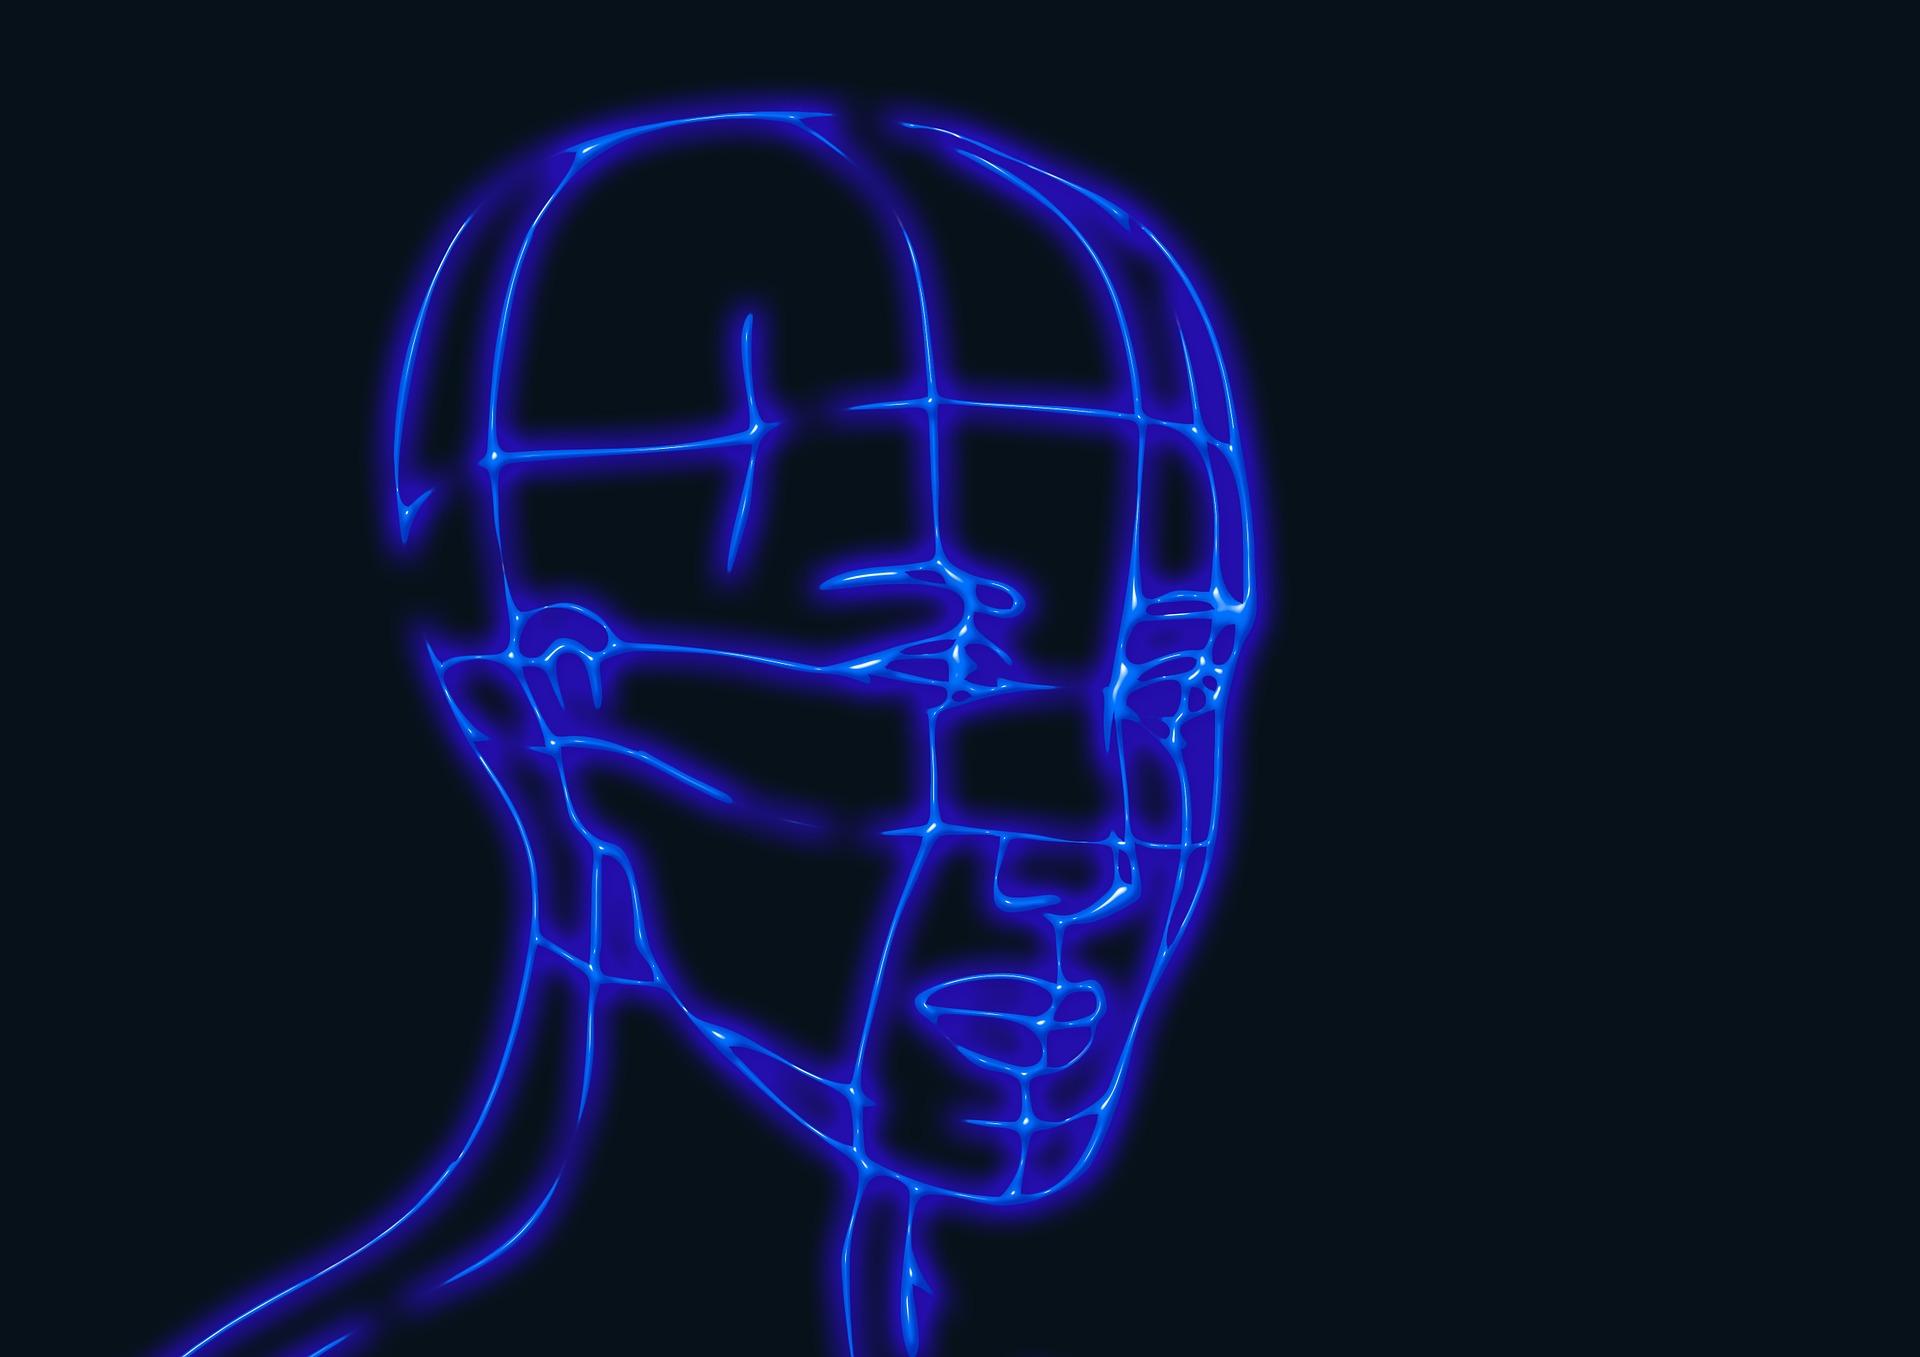 head-625666_1920.jpg